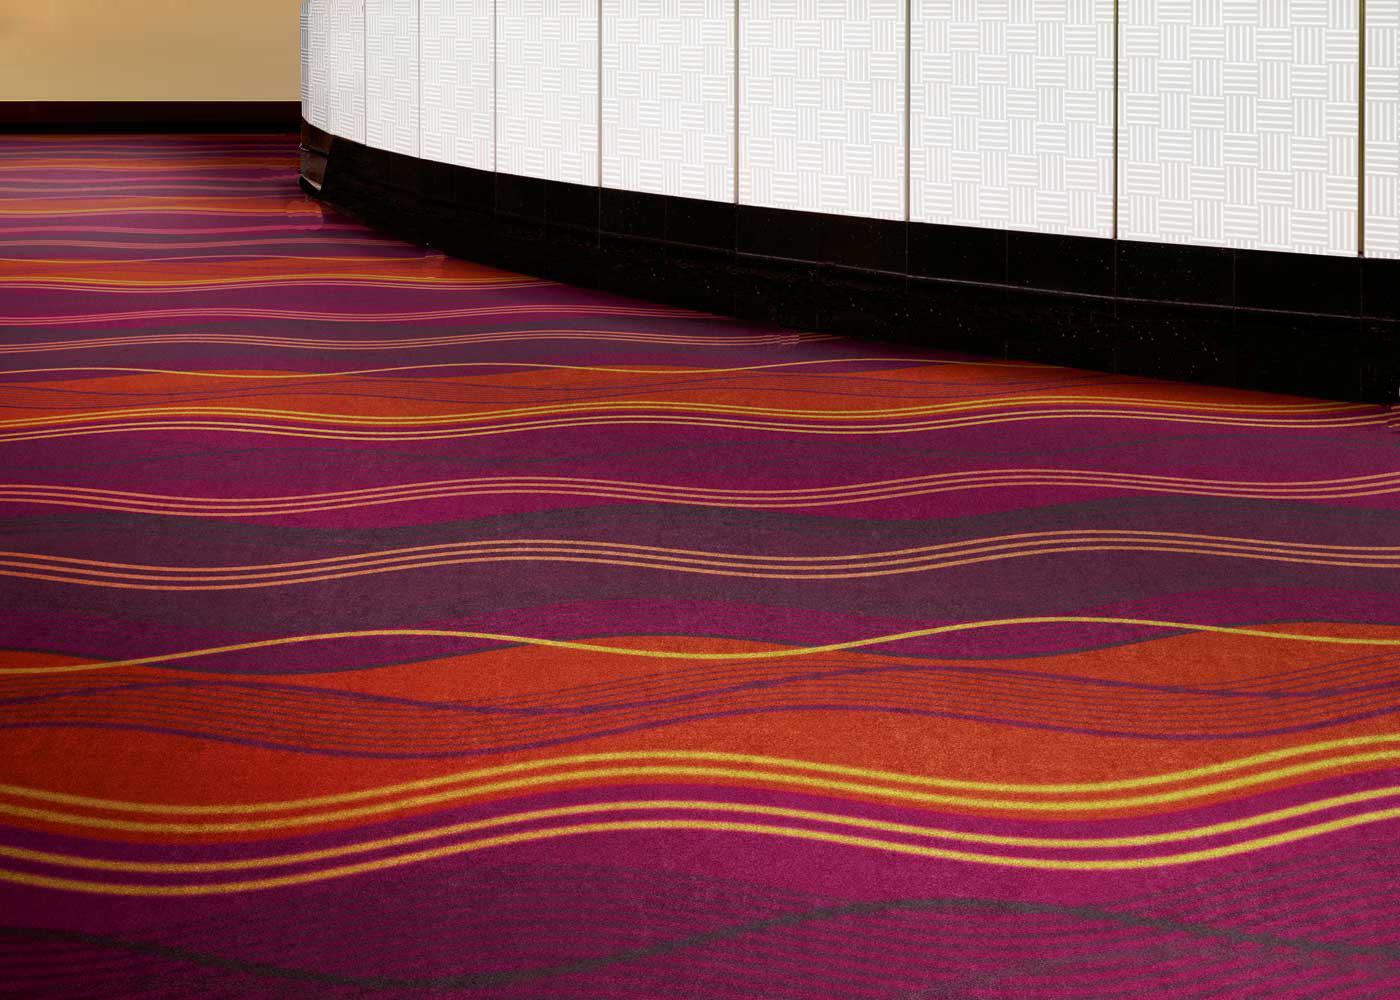 Carpet Buying Guidelines in Dubai Dubai World of  : 2 from worldofcurtains.com size 1400 x 1000 jpeg 540kB